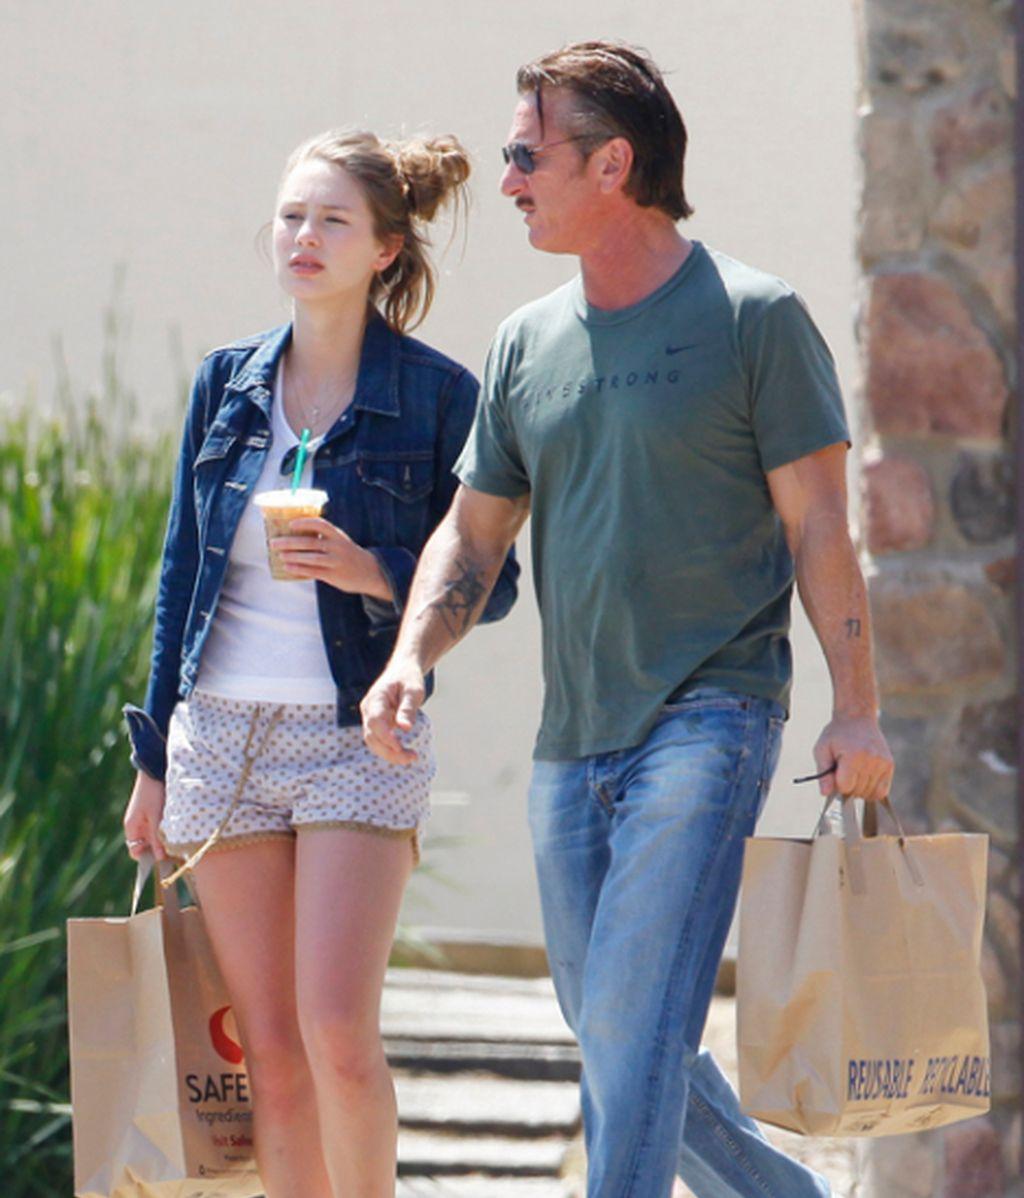 Cuando papá o mamá son estrellas de Hollywood